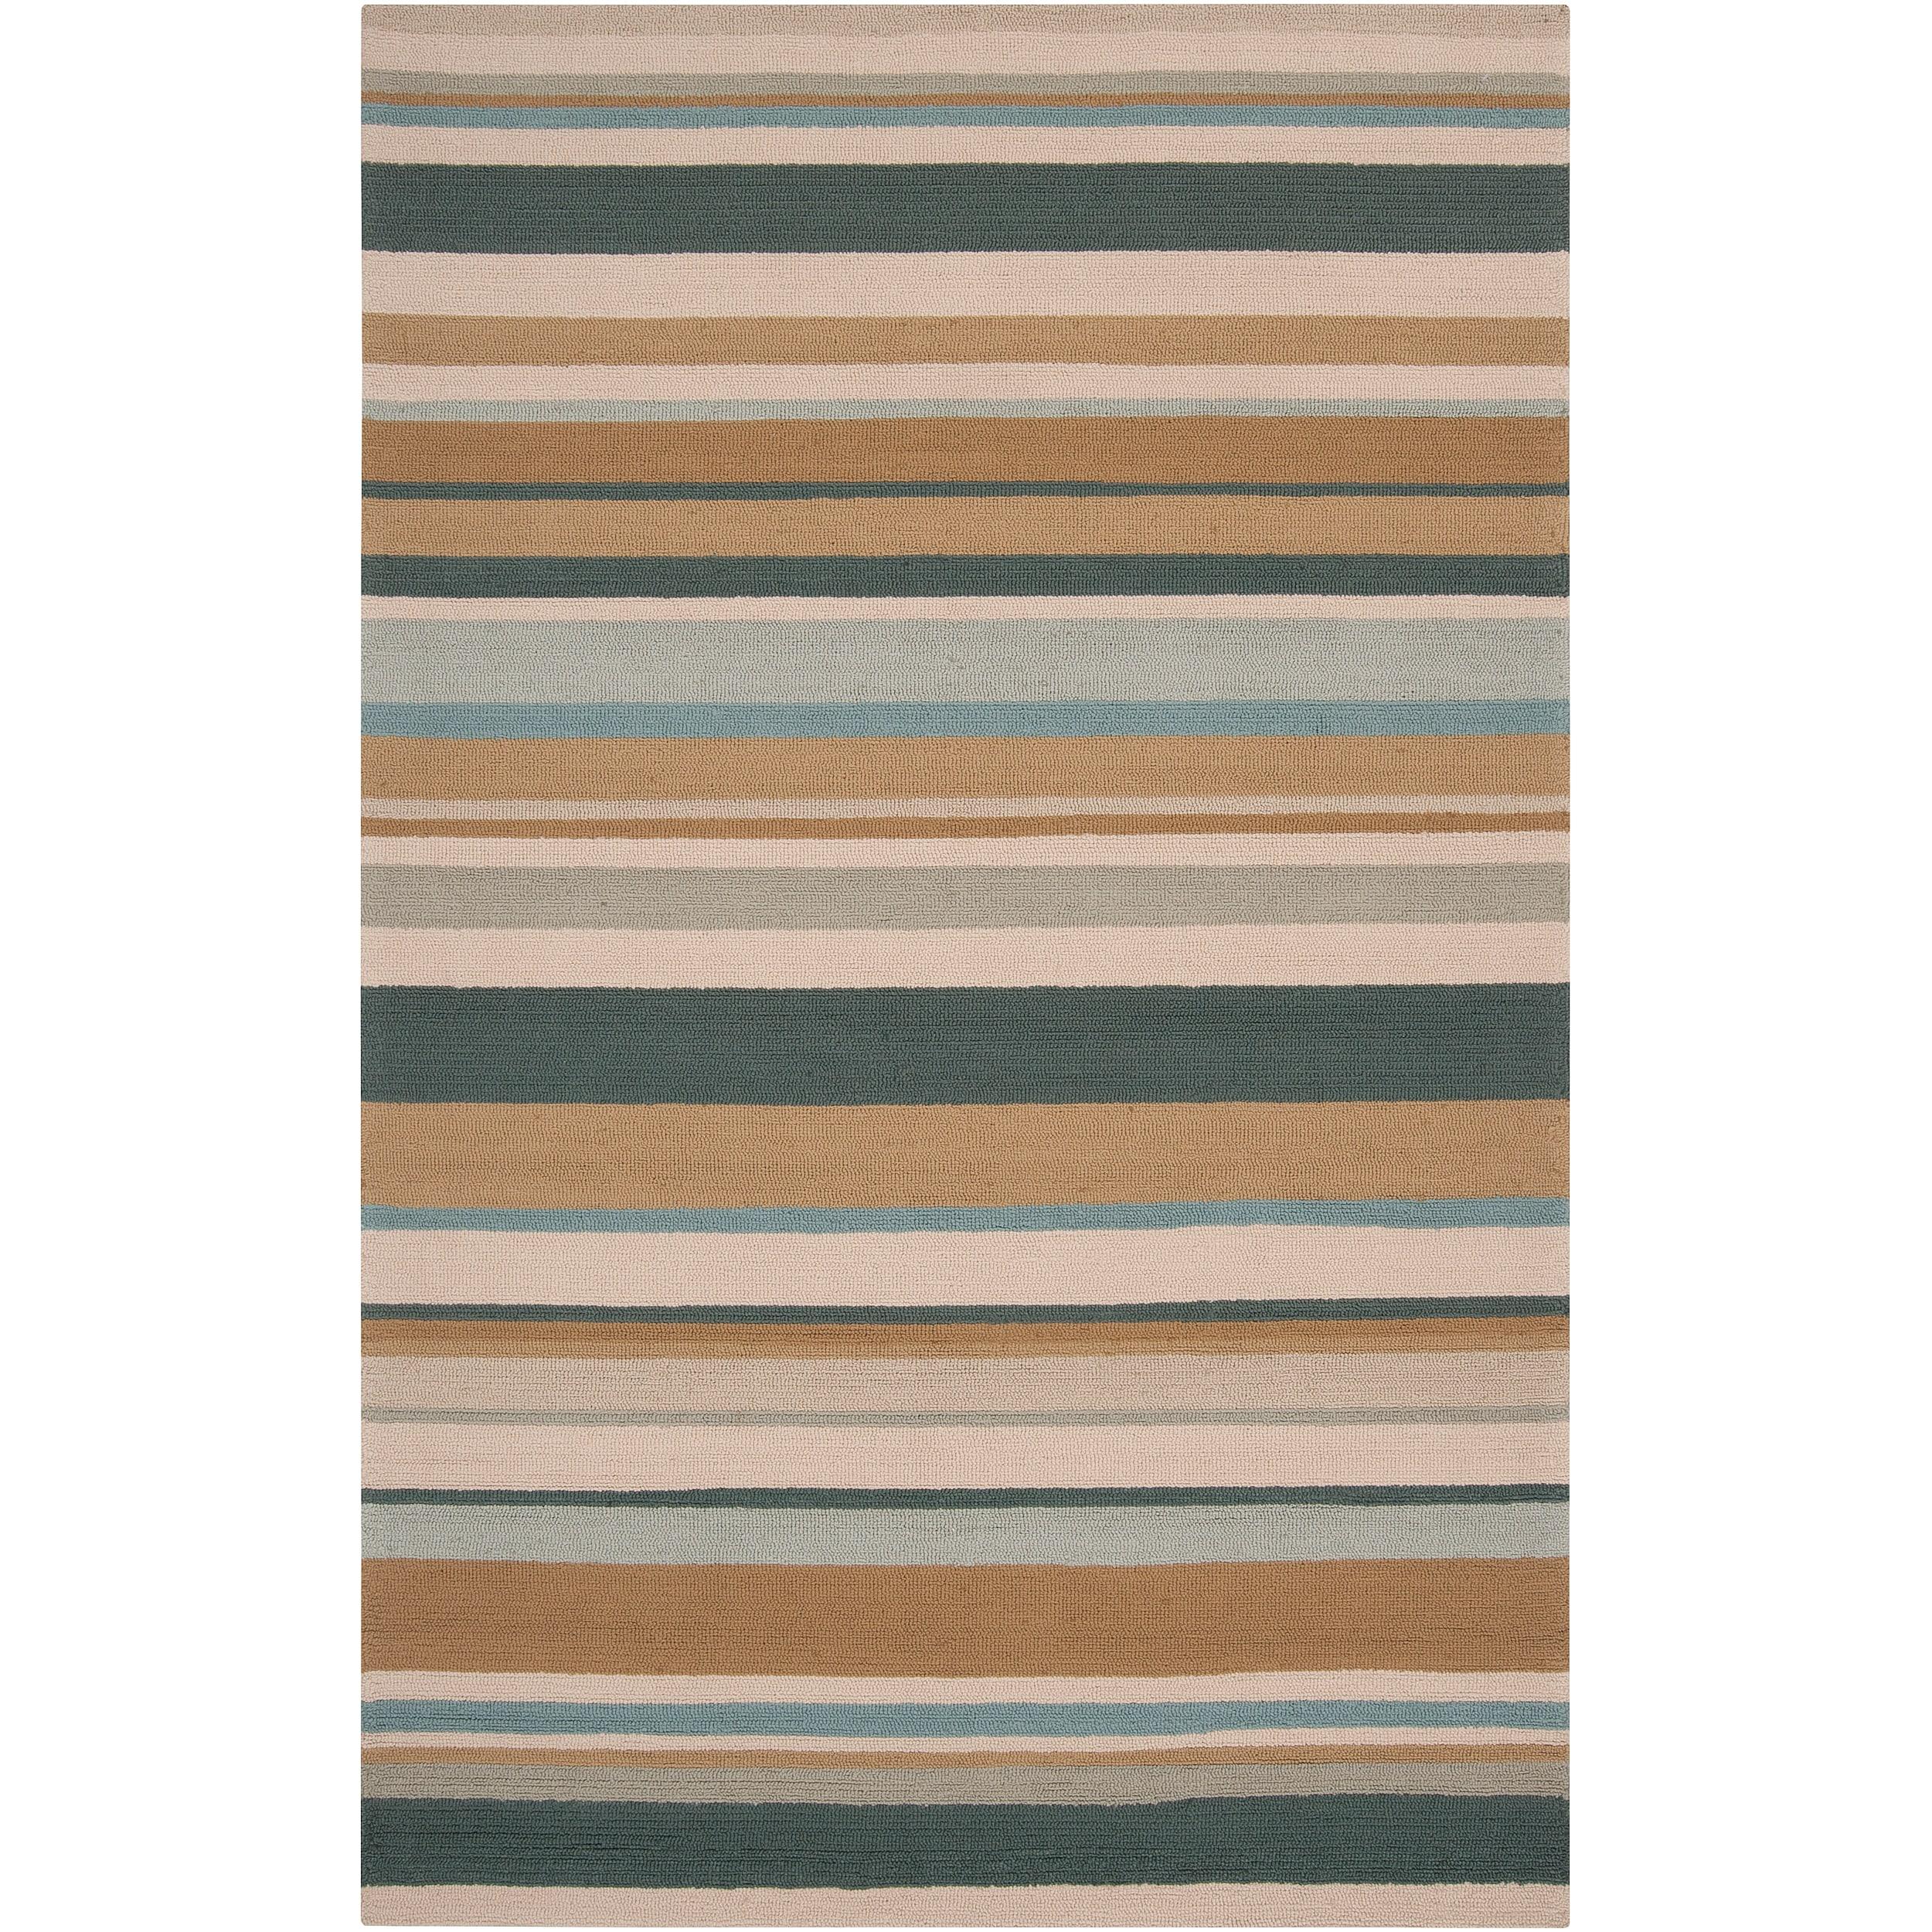 Hand-hooked Blue Caribou Indoor/Outdoor Stripe Rug (9' x 12')